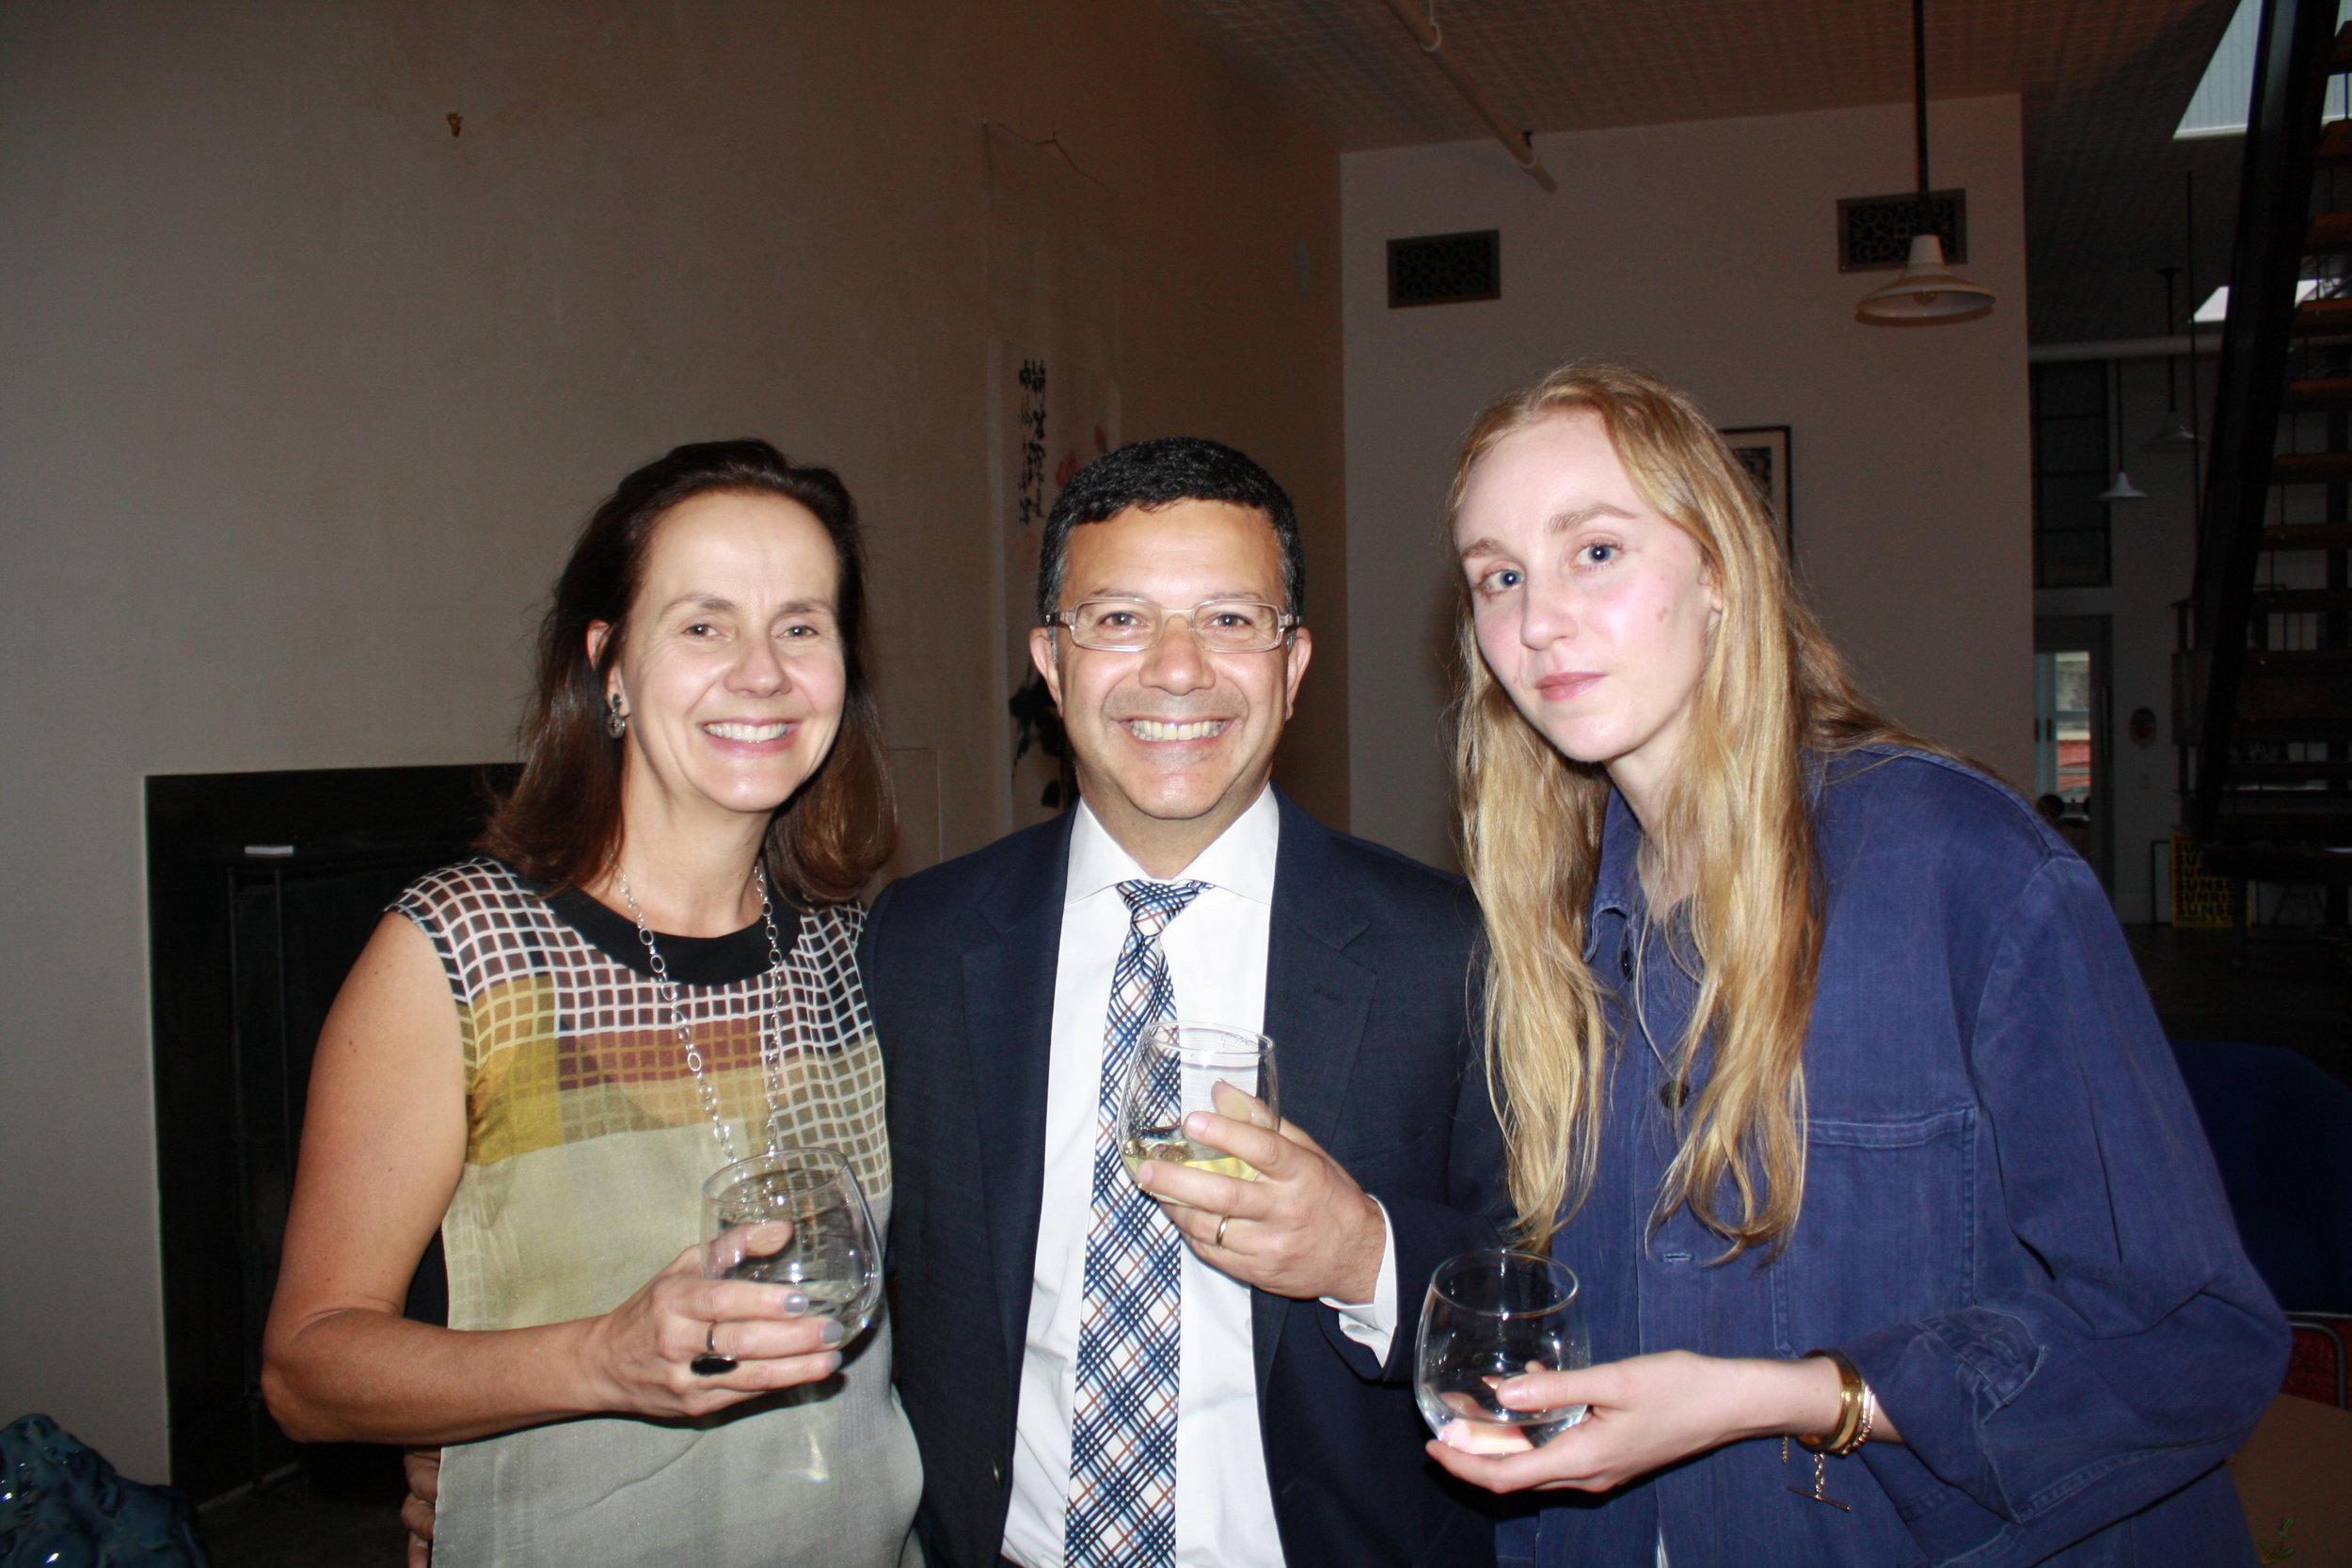 Sally Paridis, Steve Paridis and Millie Stein